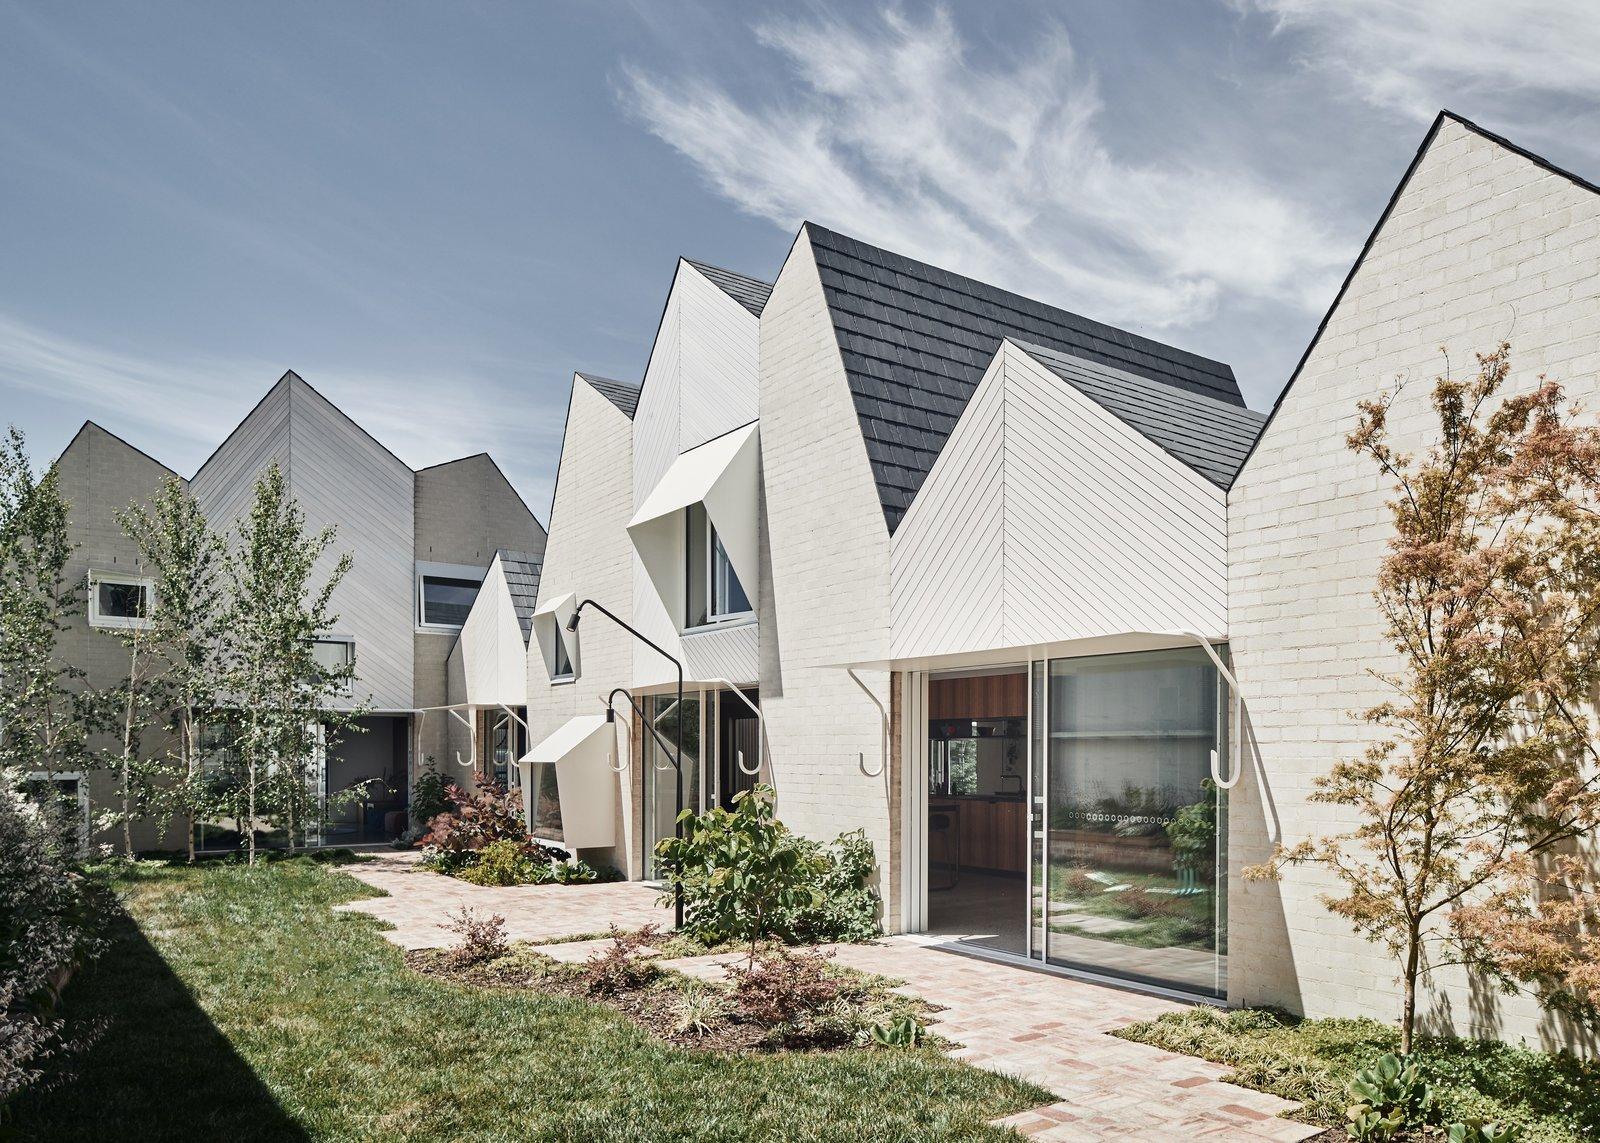 RaeRae House by Austin Maynard Architects